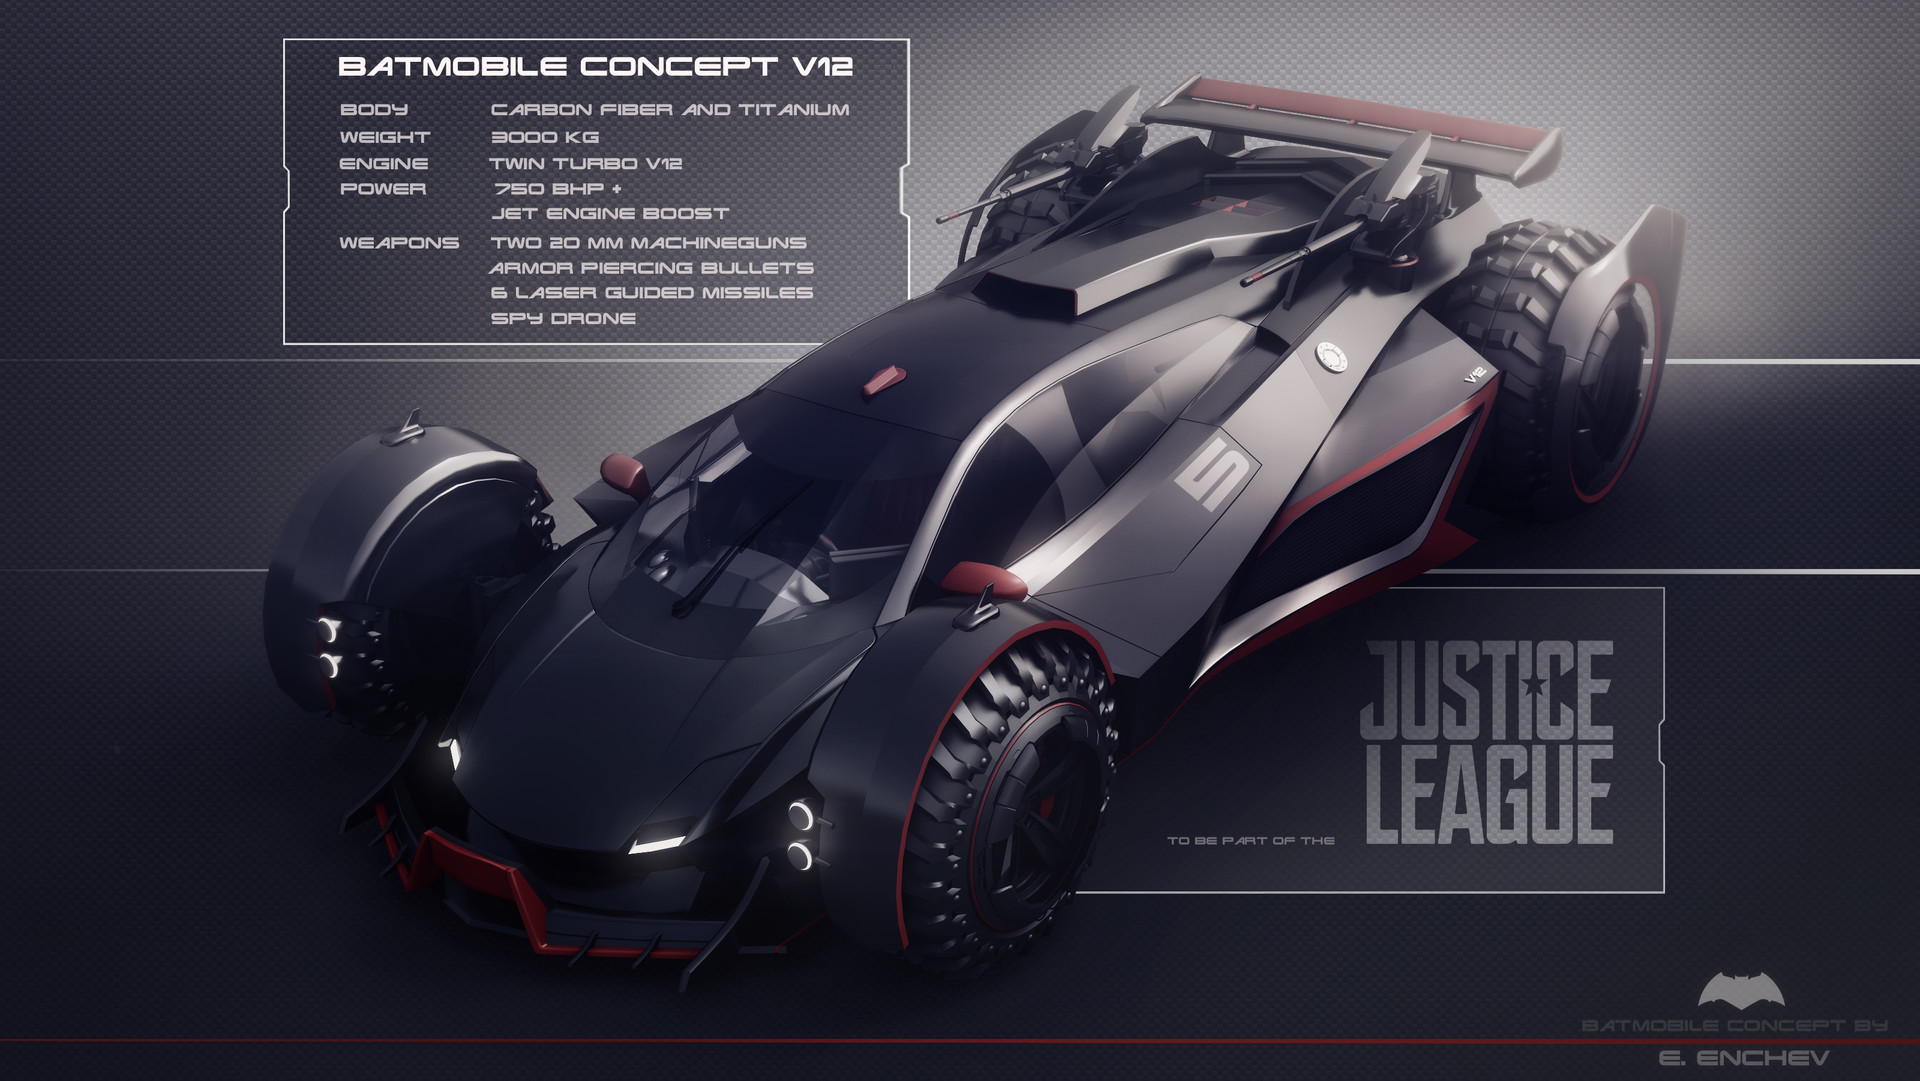 Encho Enchev Batmobile Concept V12